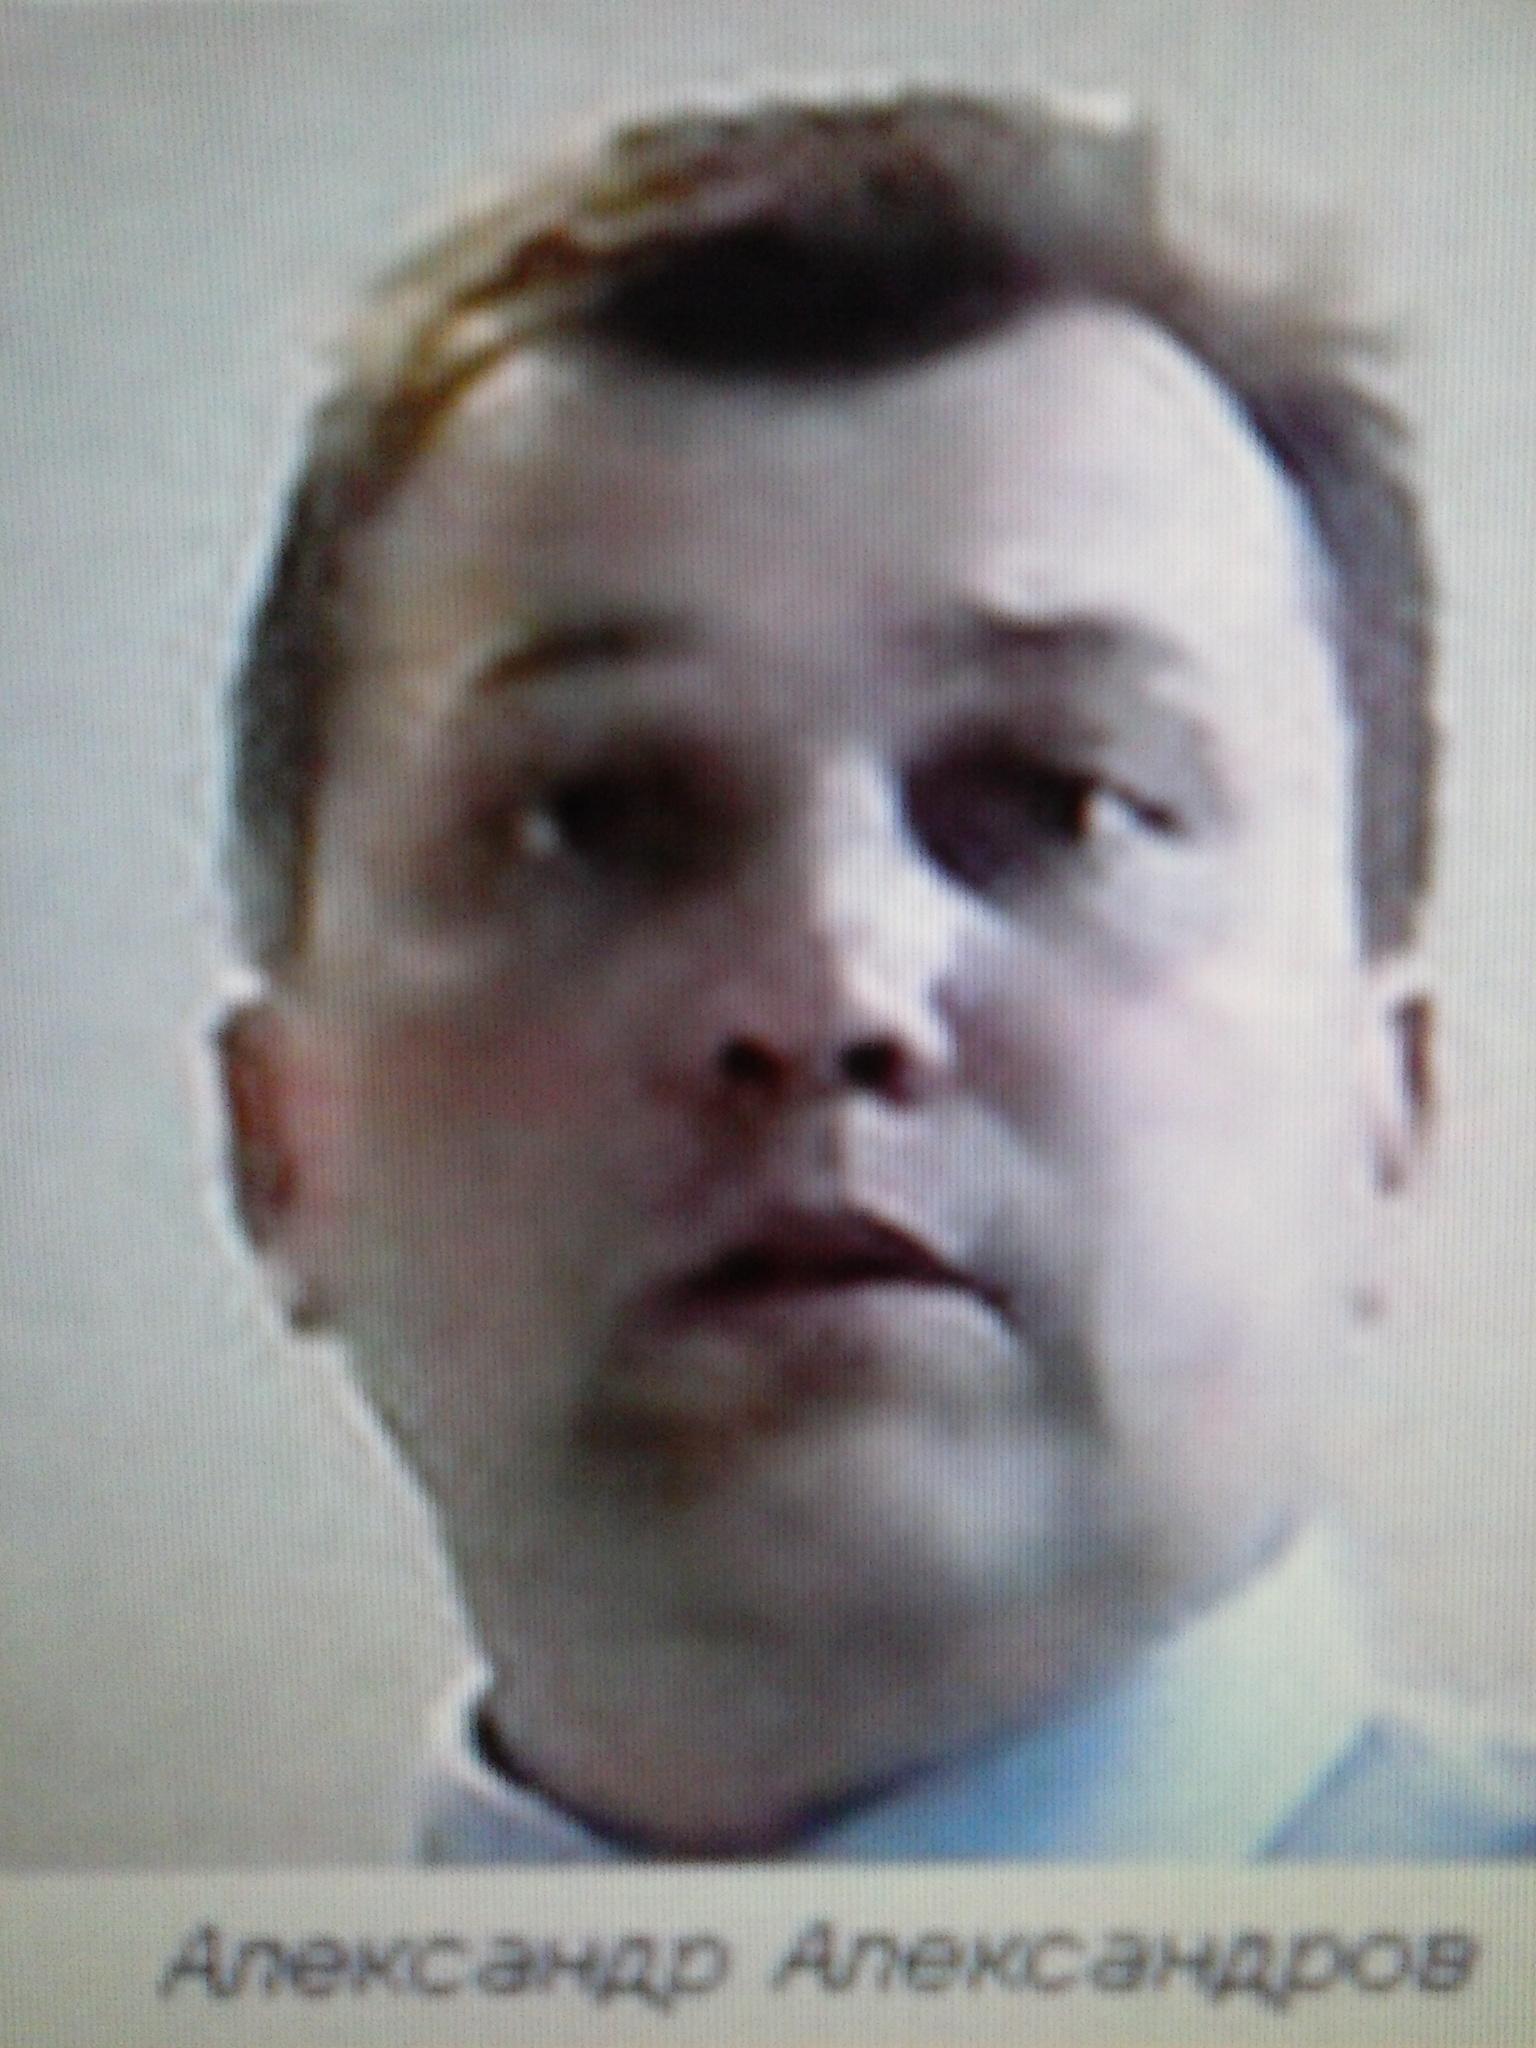 Александр Александров. Доска позора.